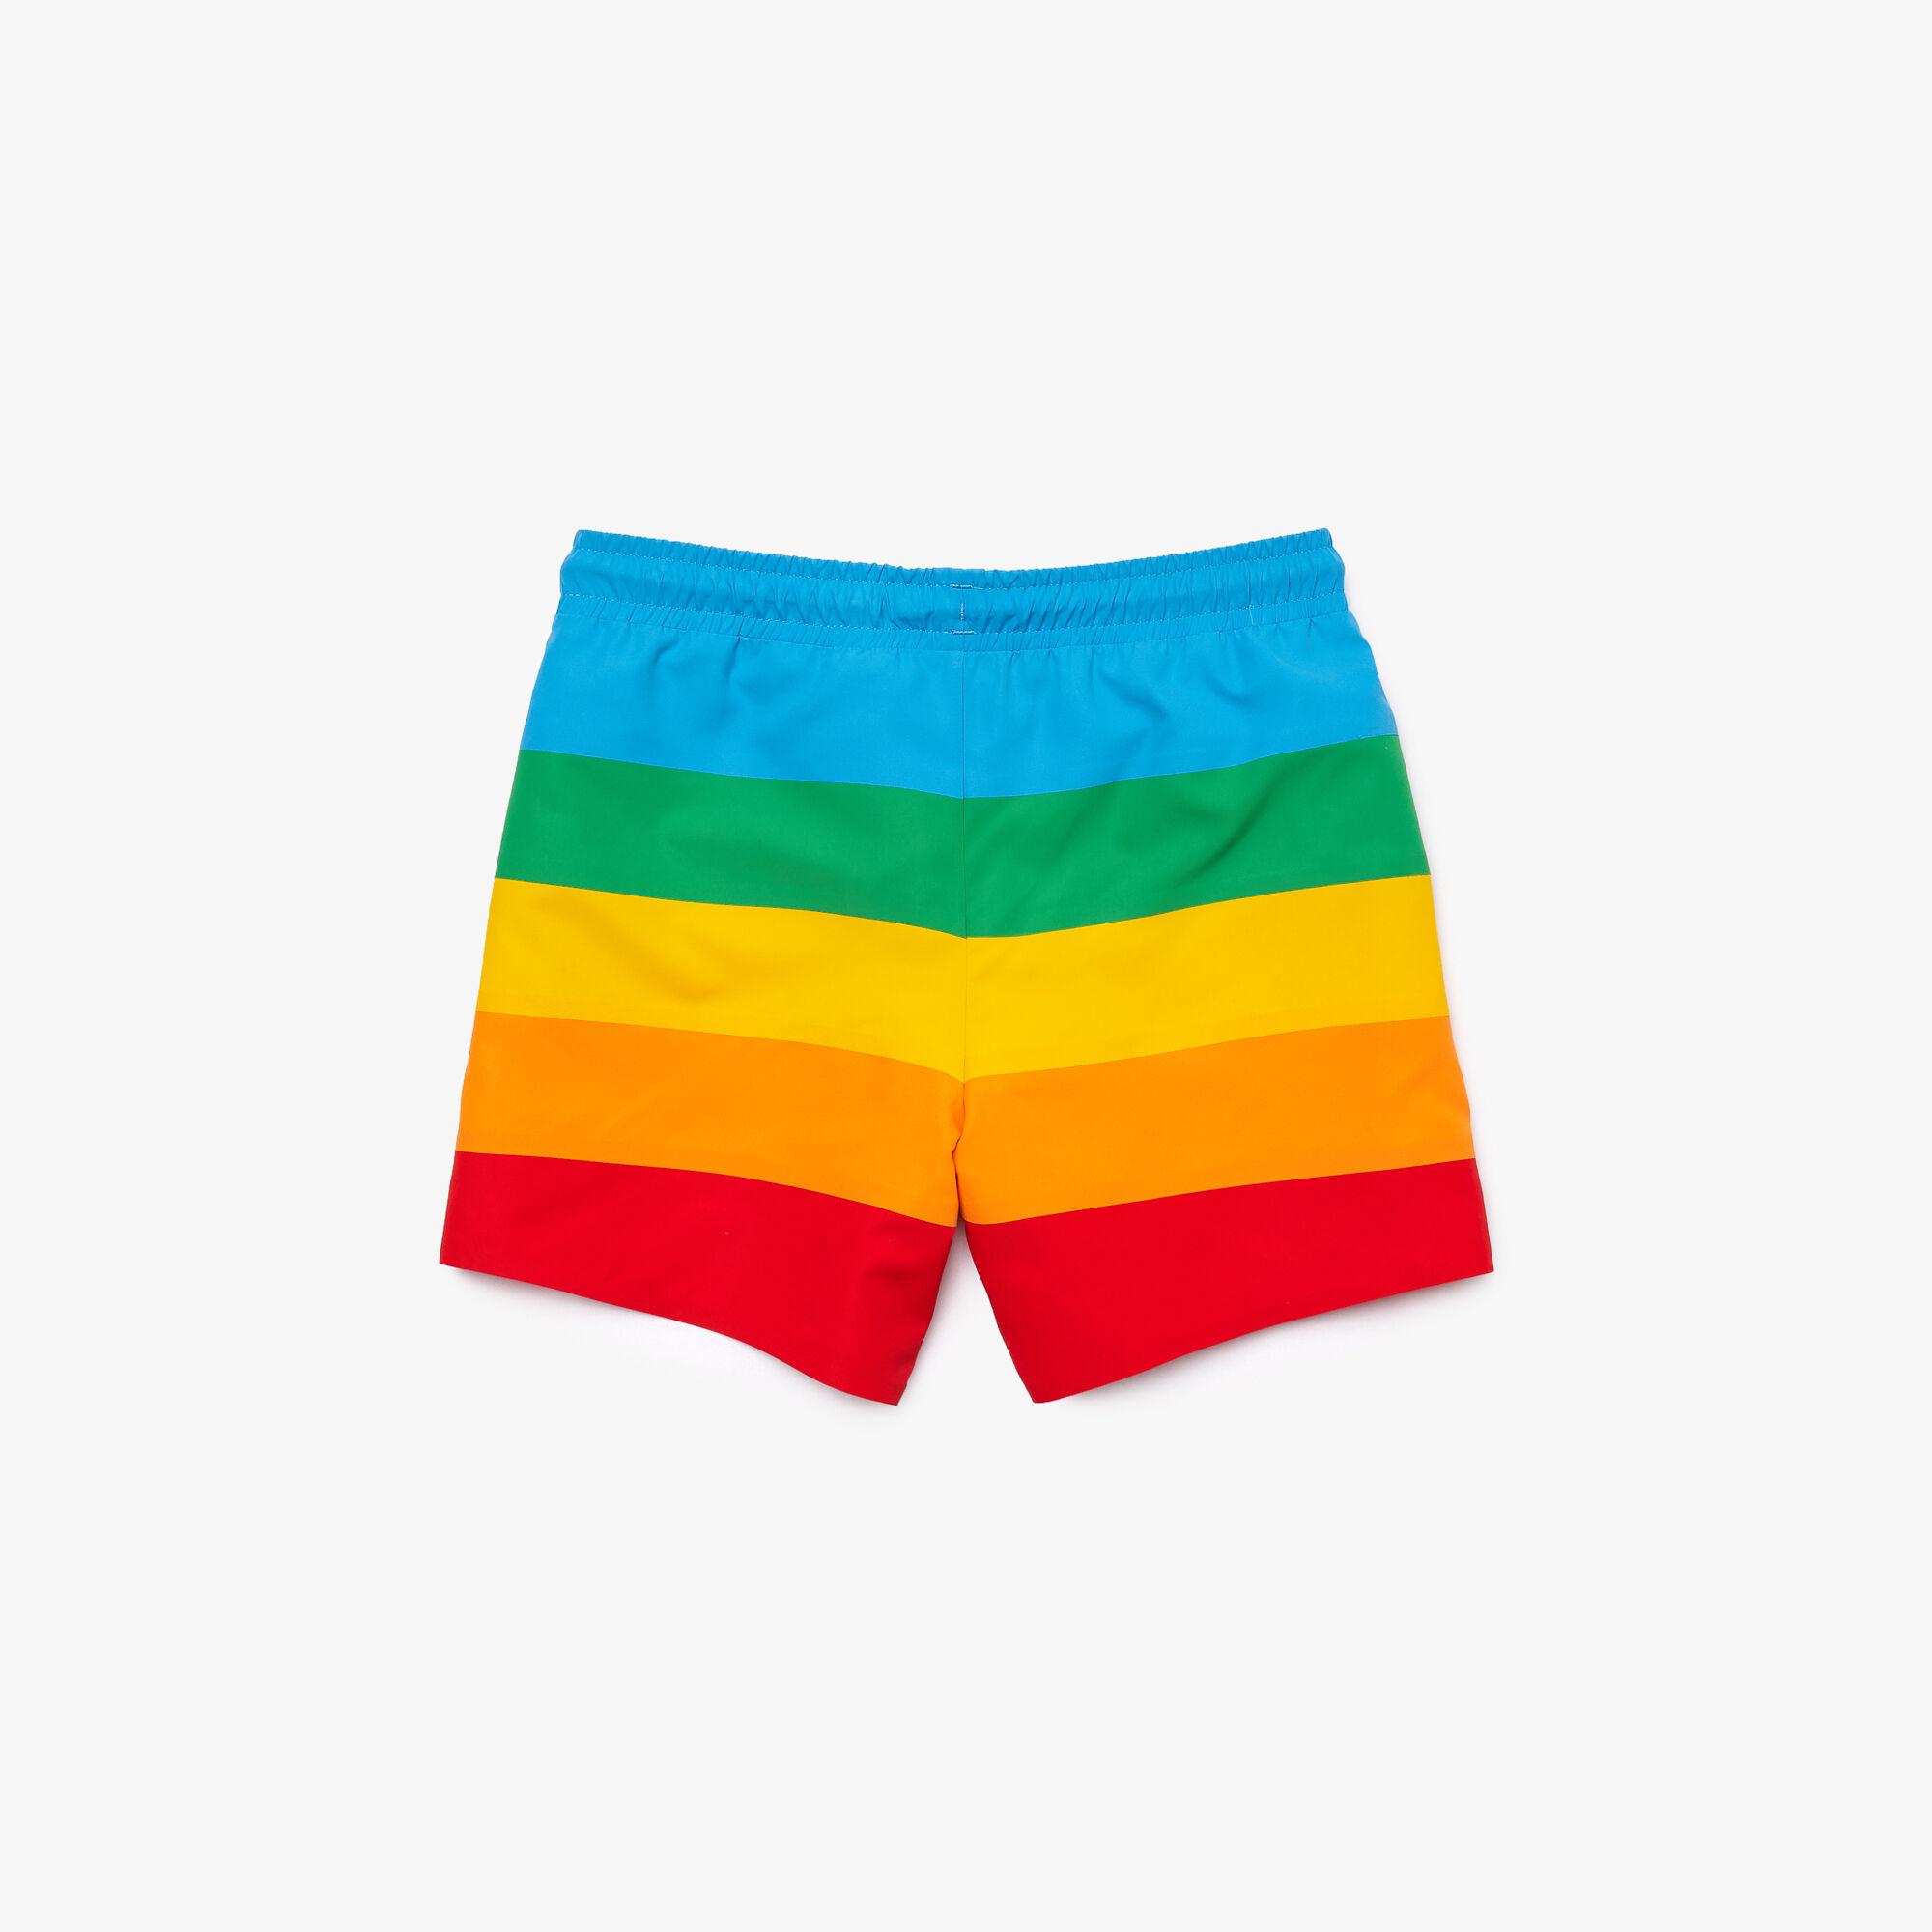 Boys' Polaroid Collaboration Color Striped Swimming Trunks